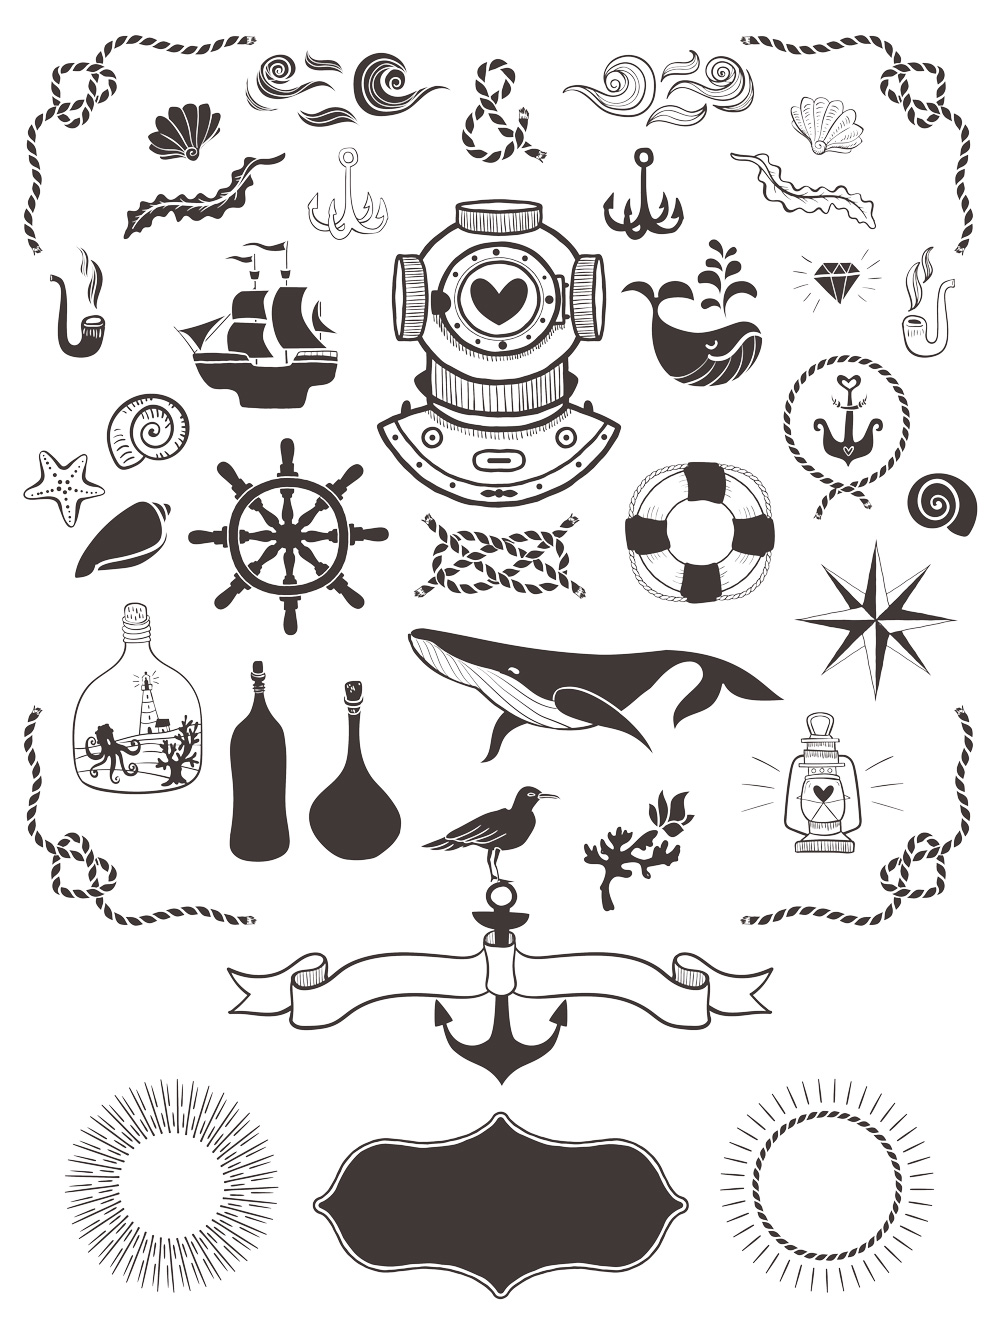 40+ Free Nautical Vector Elements